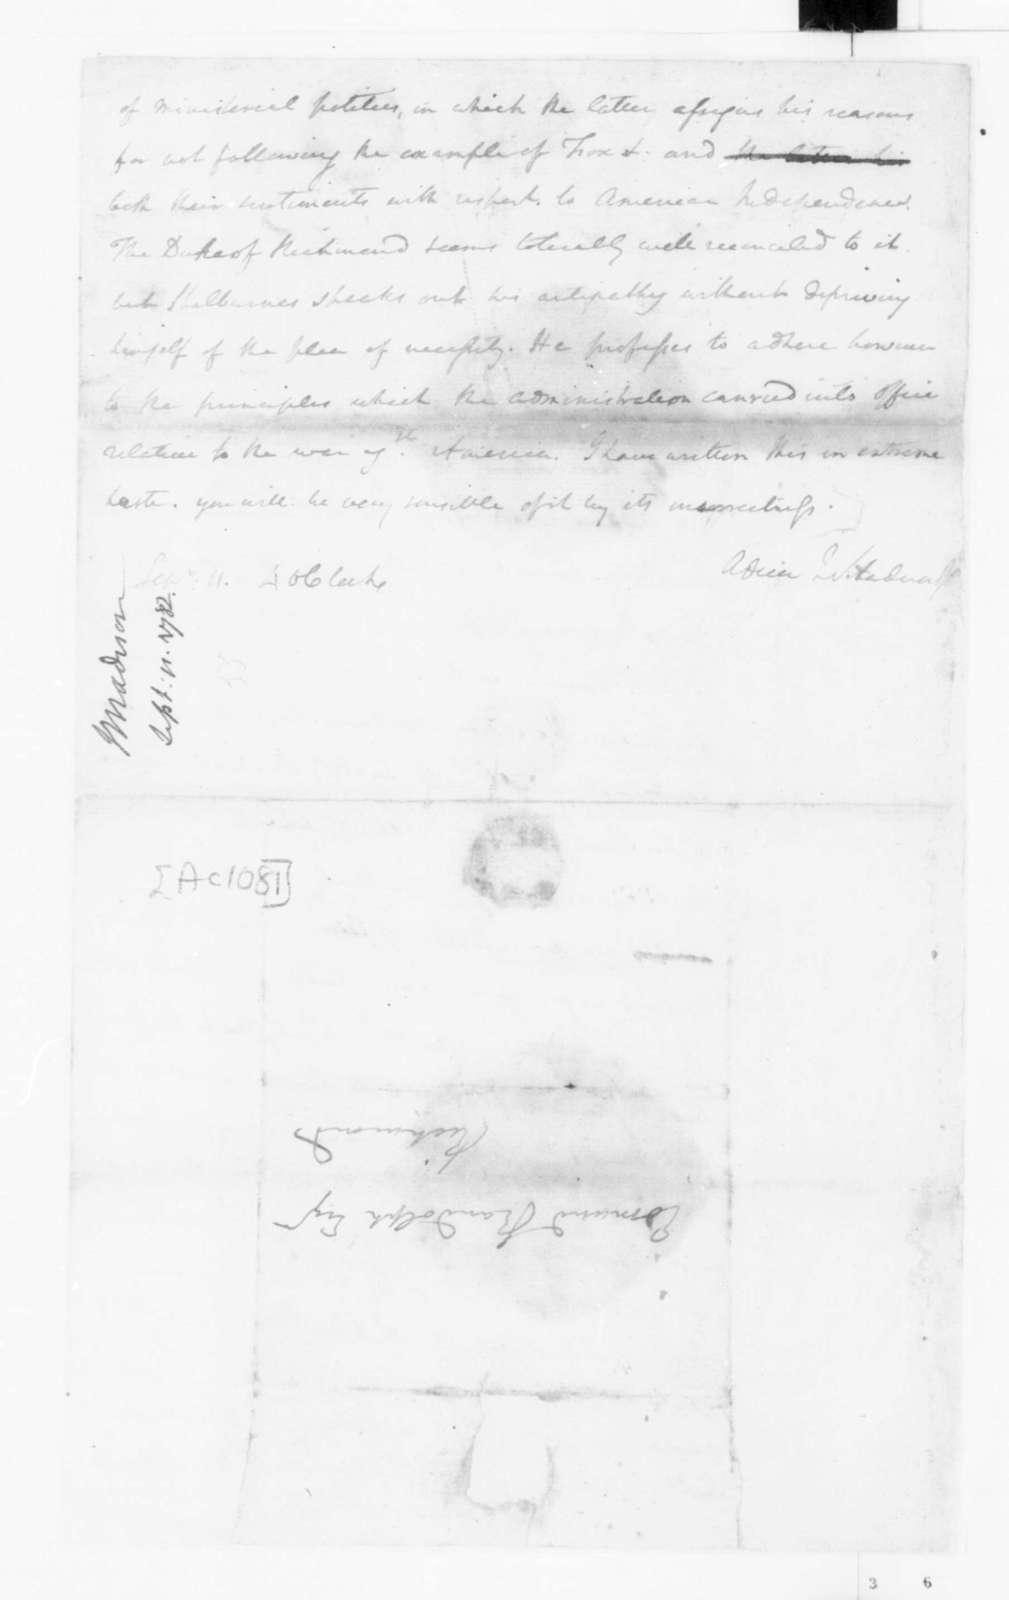 James Madison to Edmund Randolph, September 11, 1782. with copy.